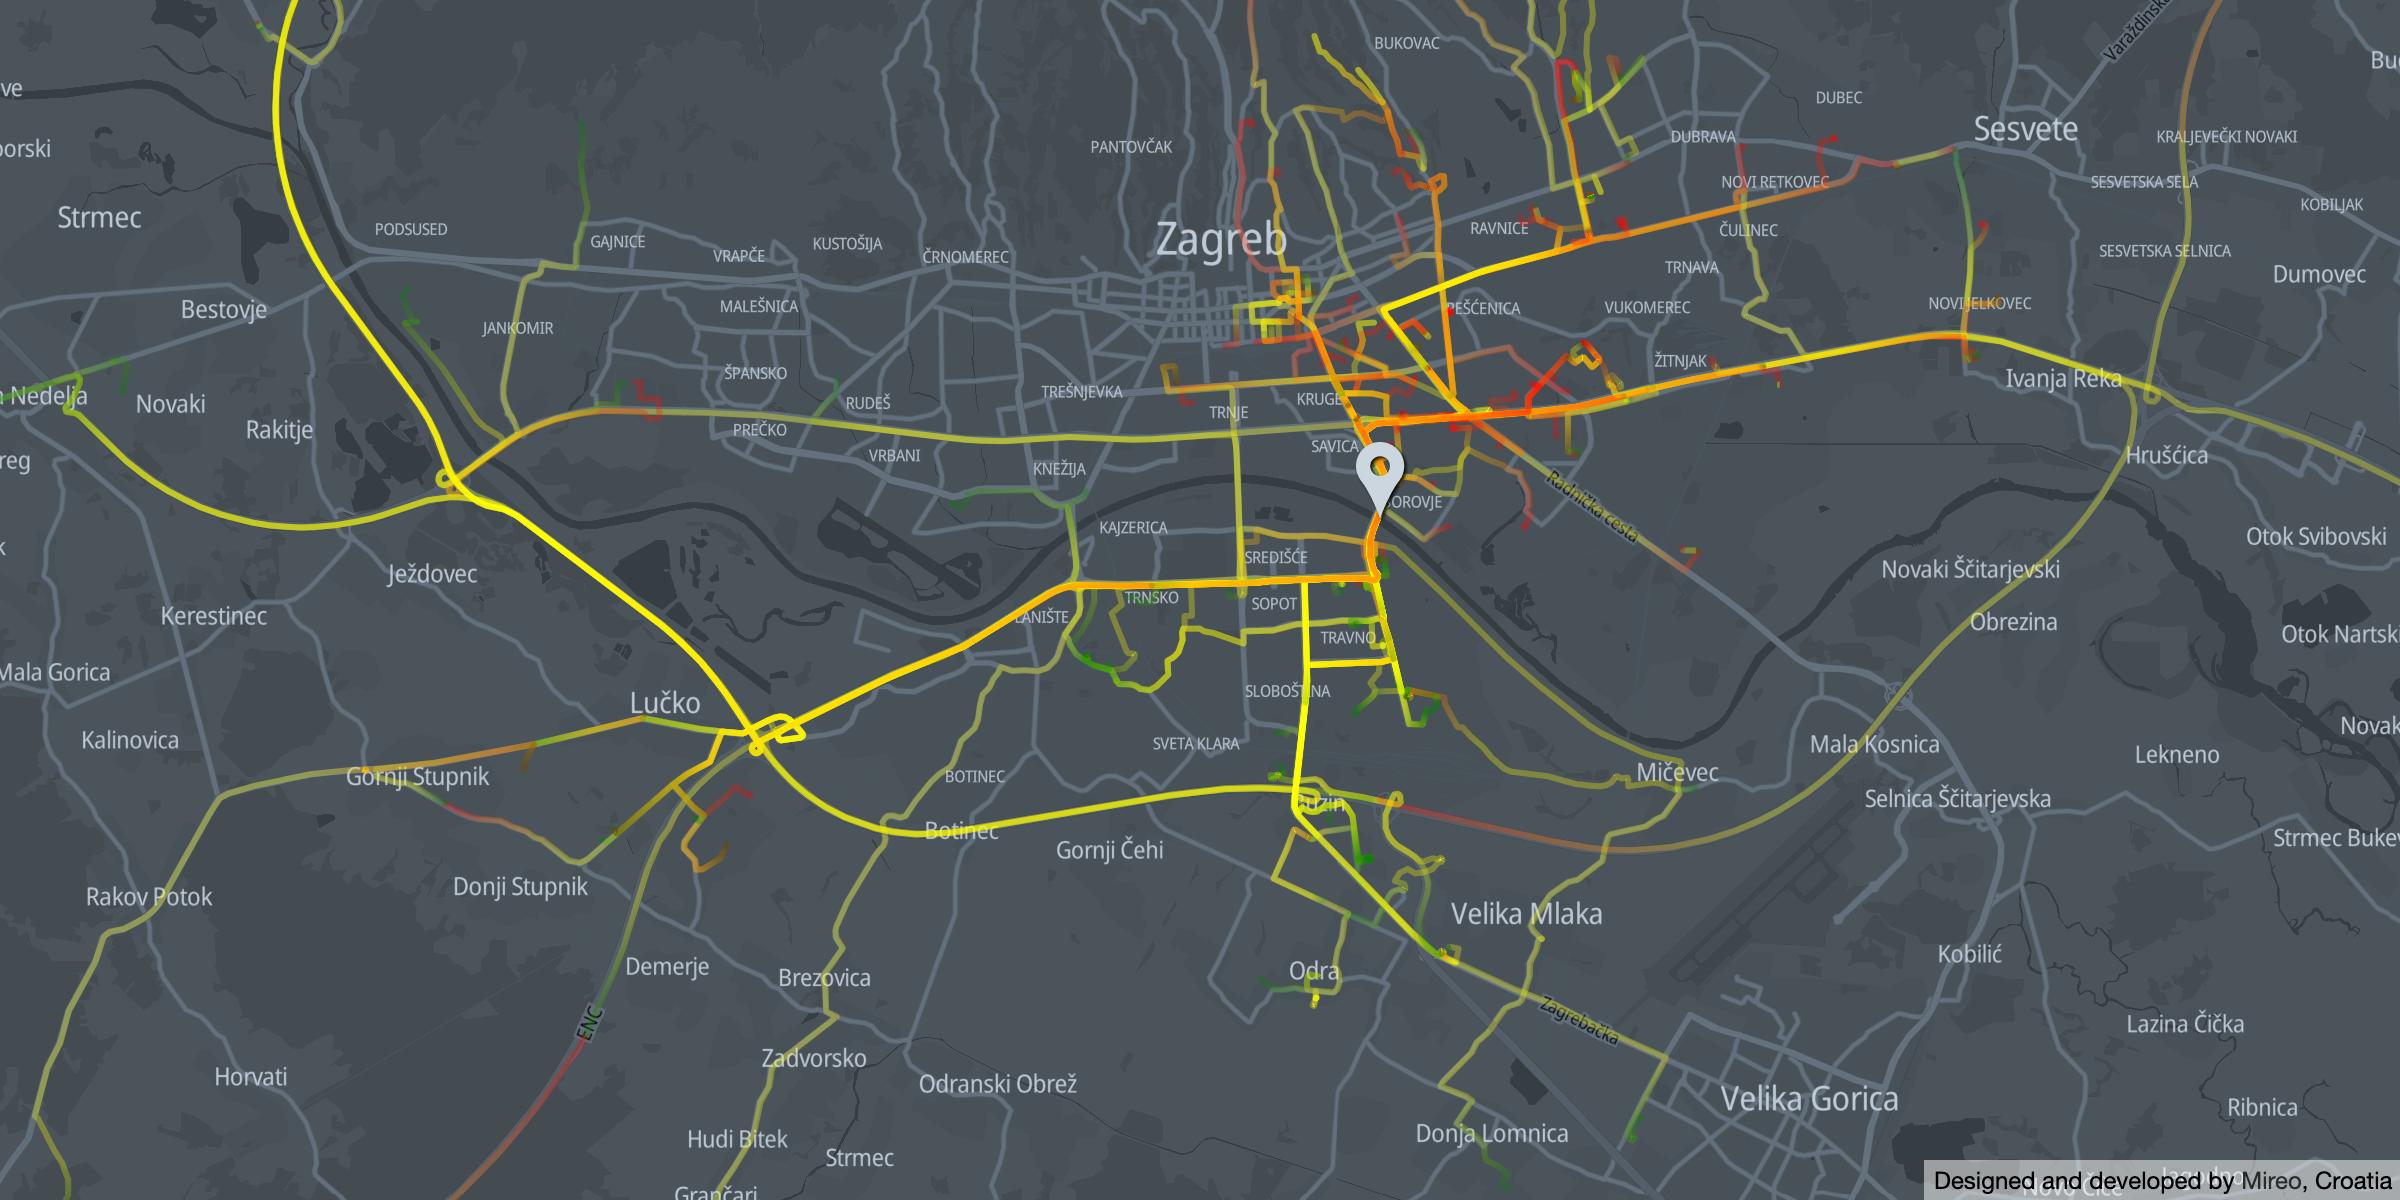 Morning traffic across Youth Bridge - direction north   Zagreb promet preko Mosta mladosti smjer sjever